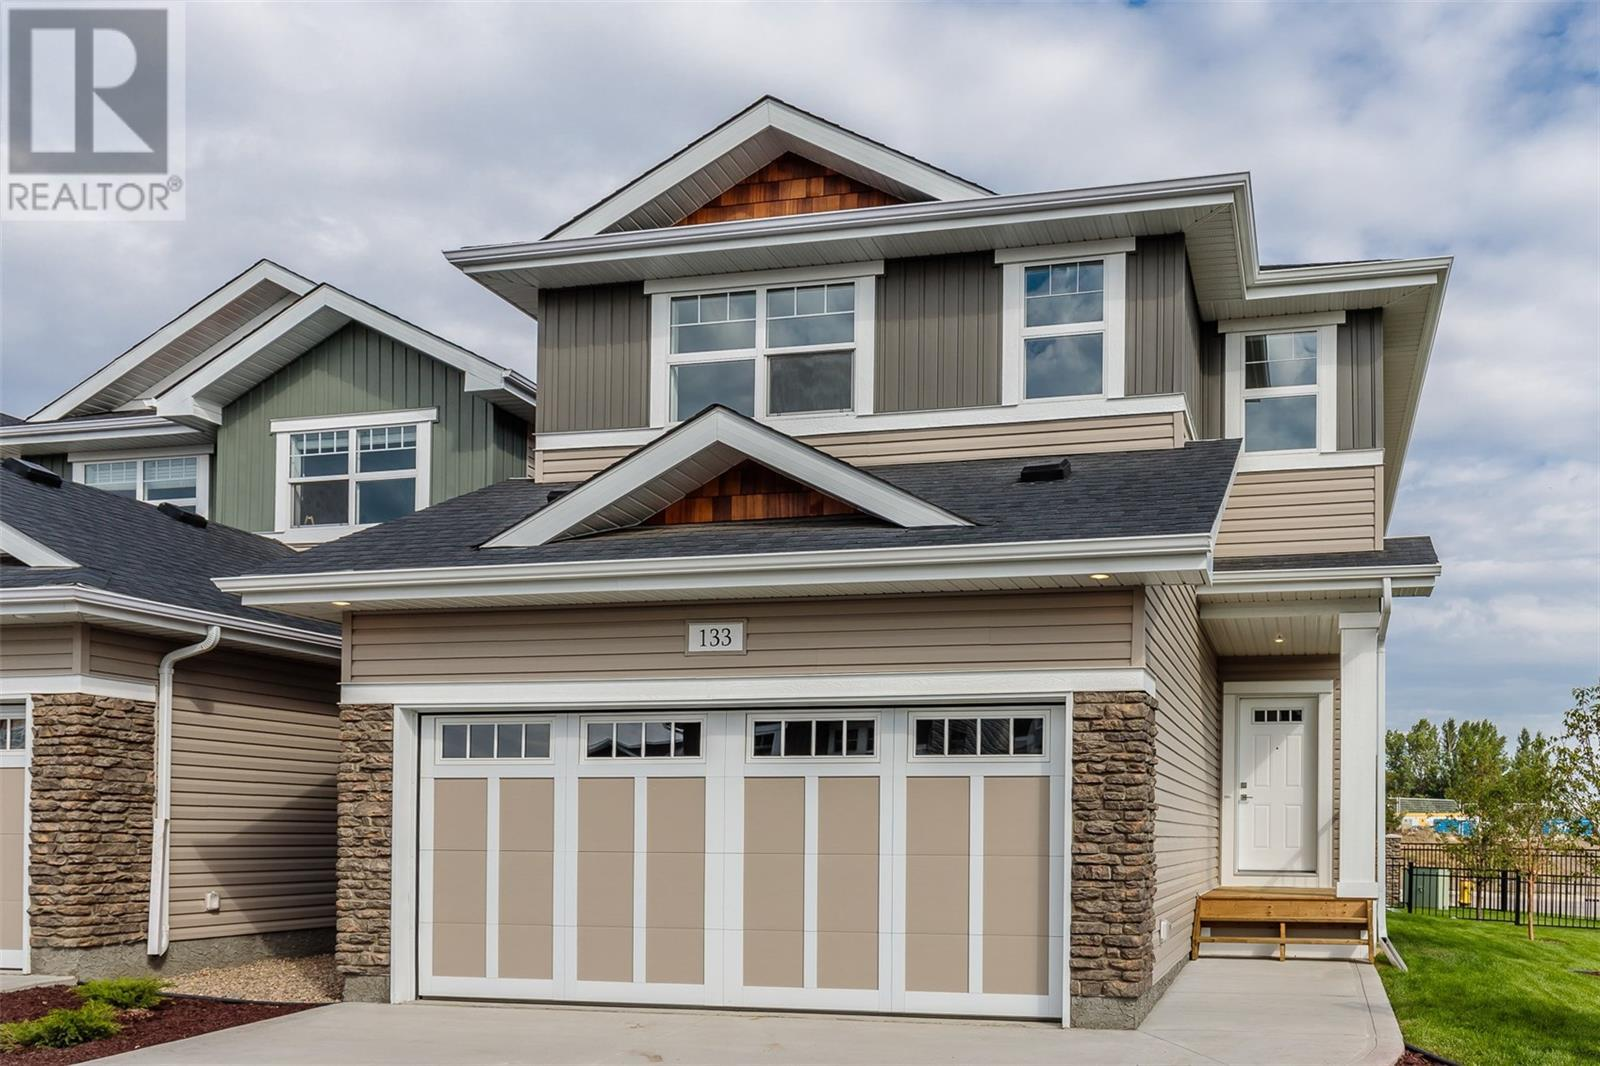 119 315 Dickson CRES, saskatoon, Saskatchewan